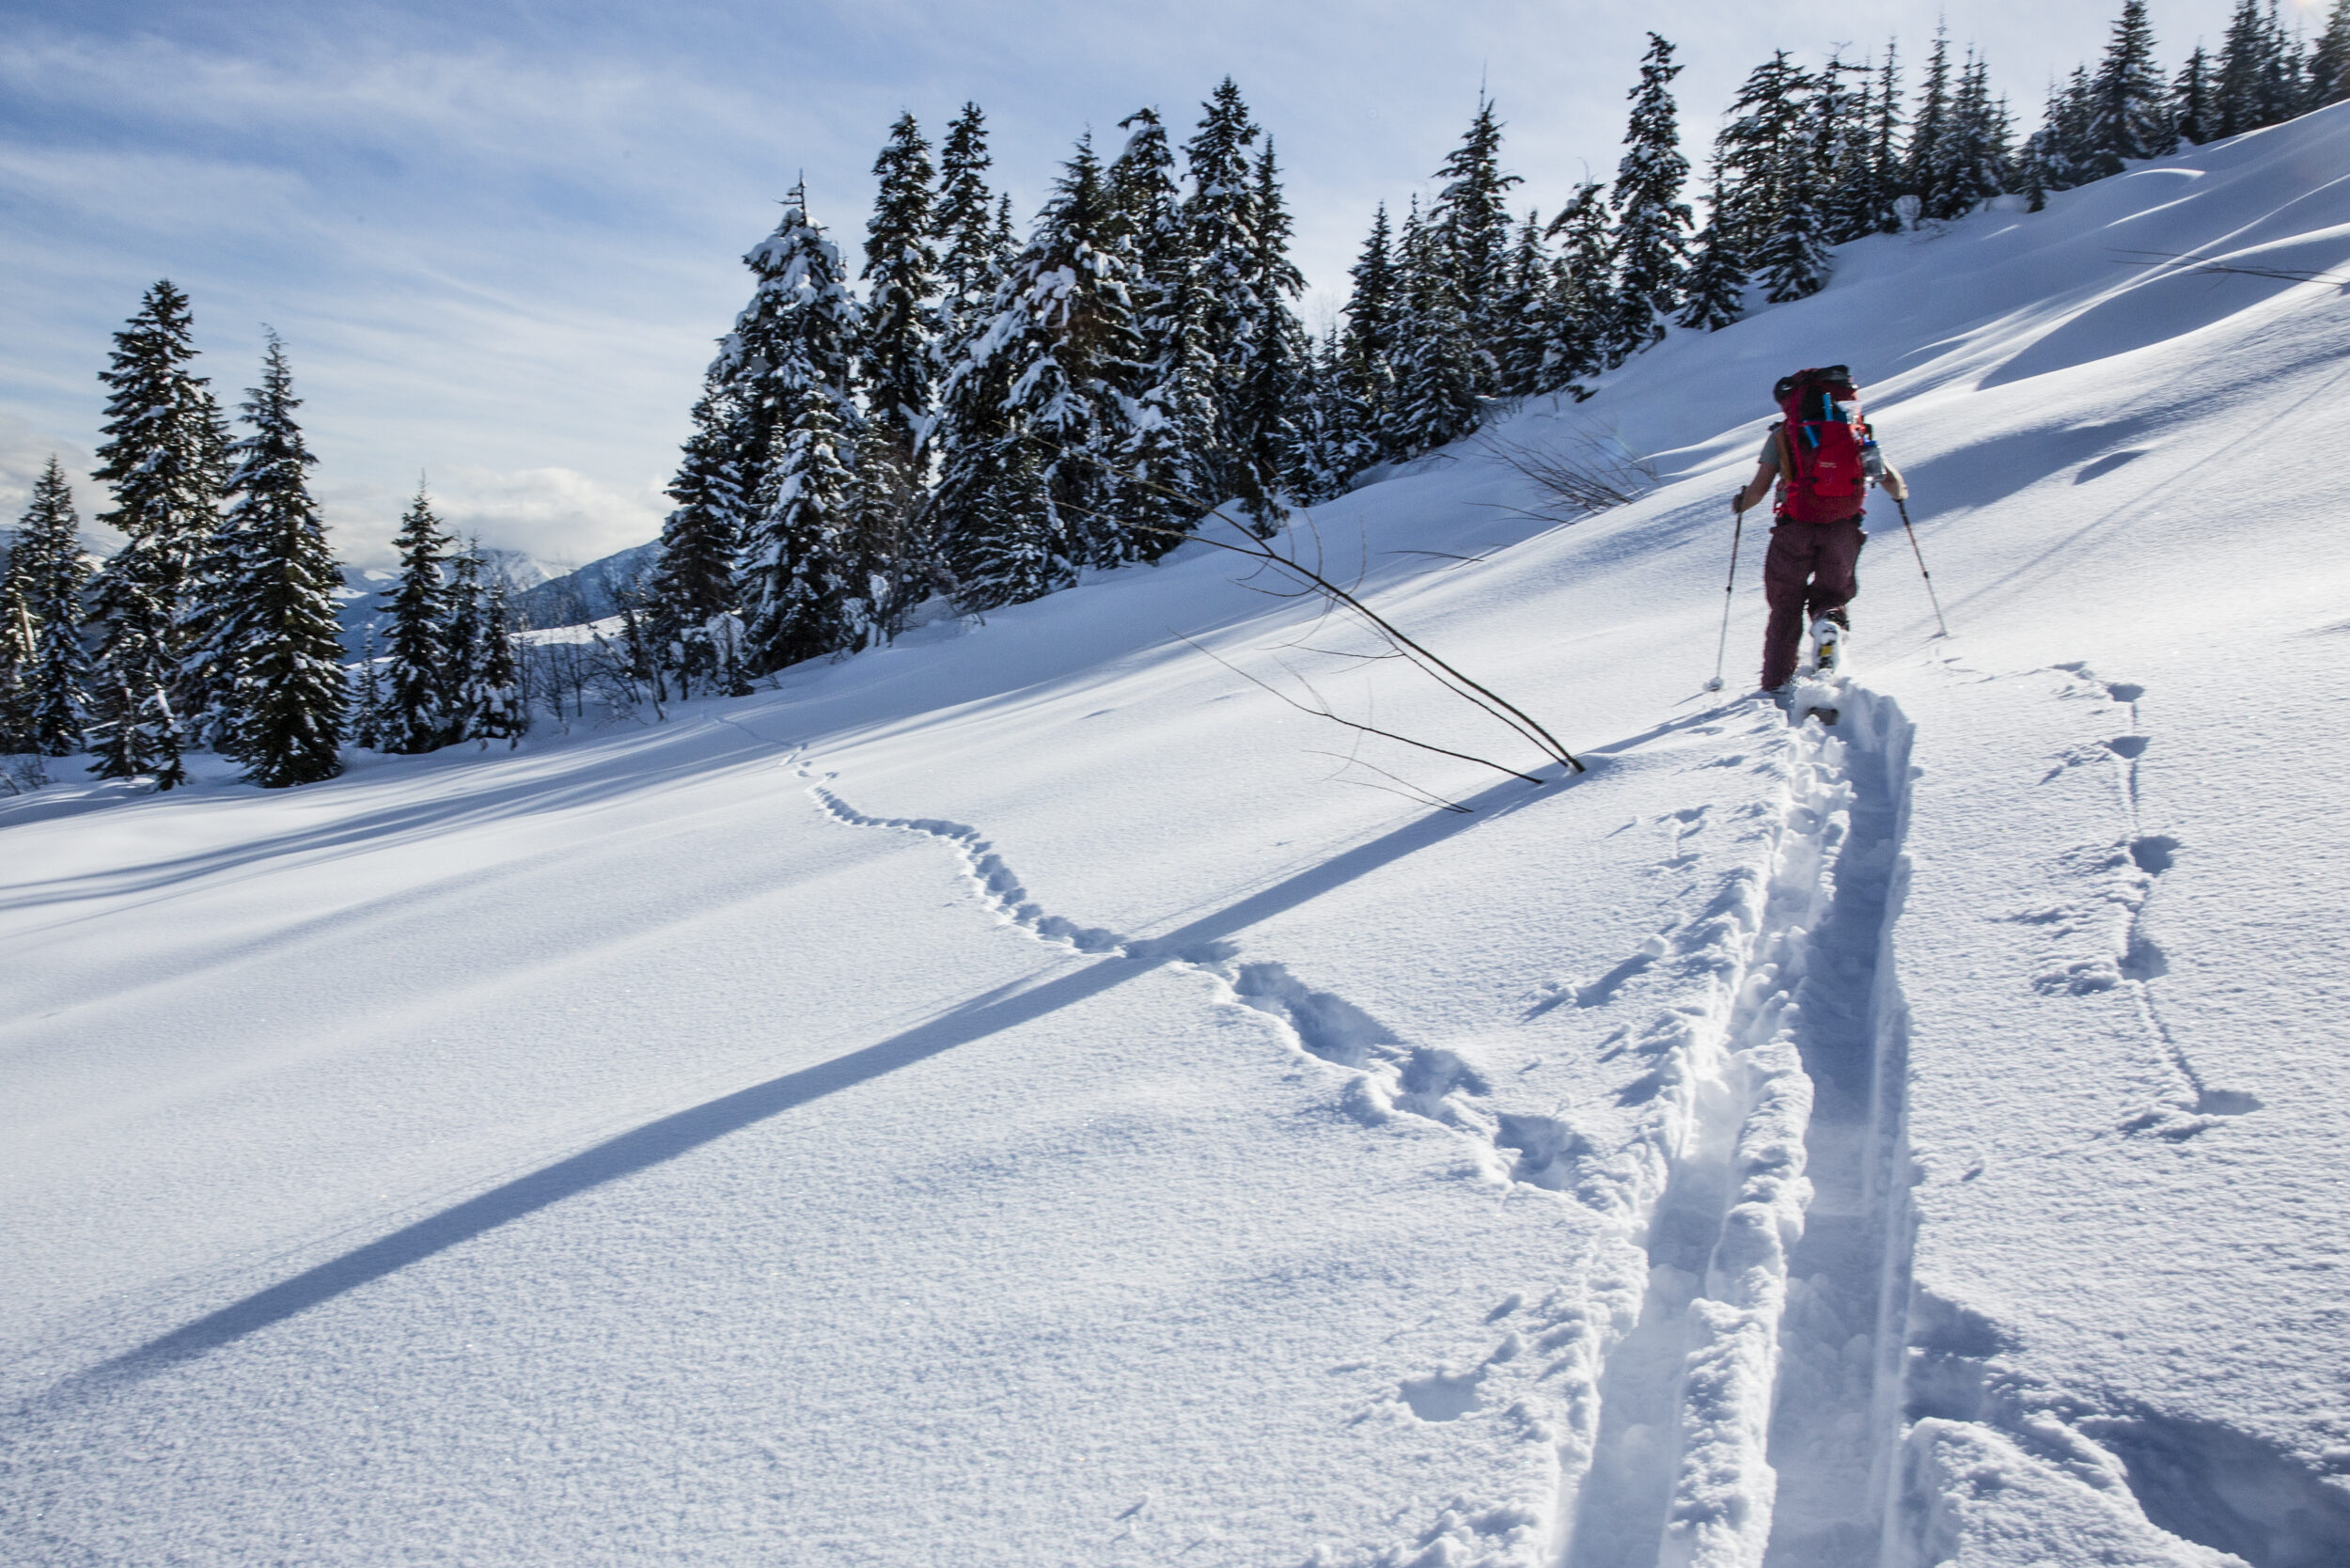 Backcountry skier wolverine track David Moskowitz